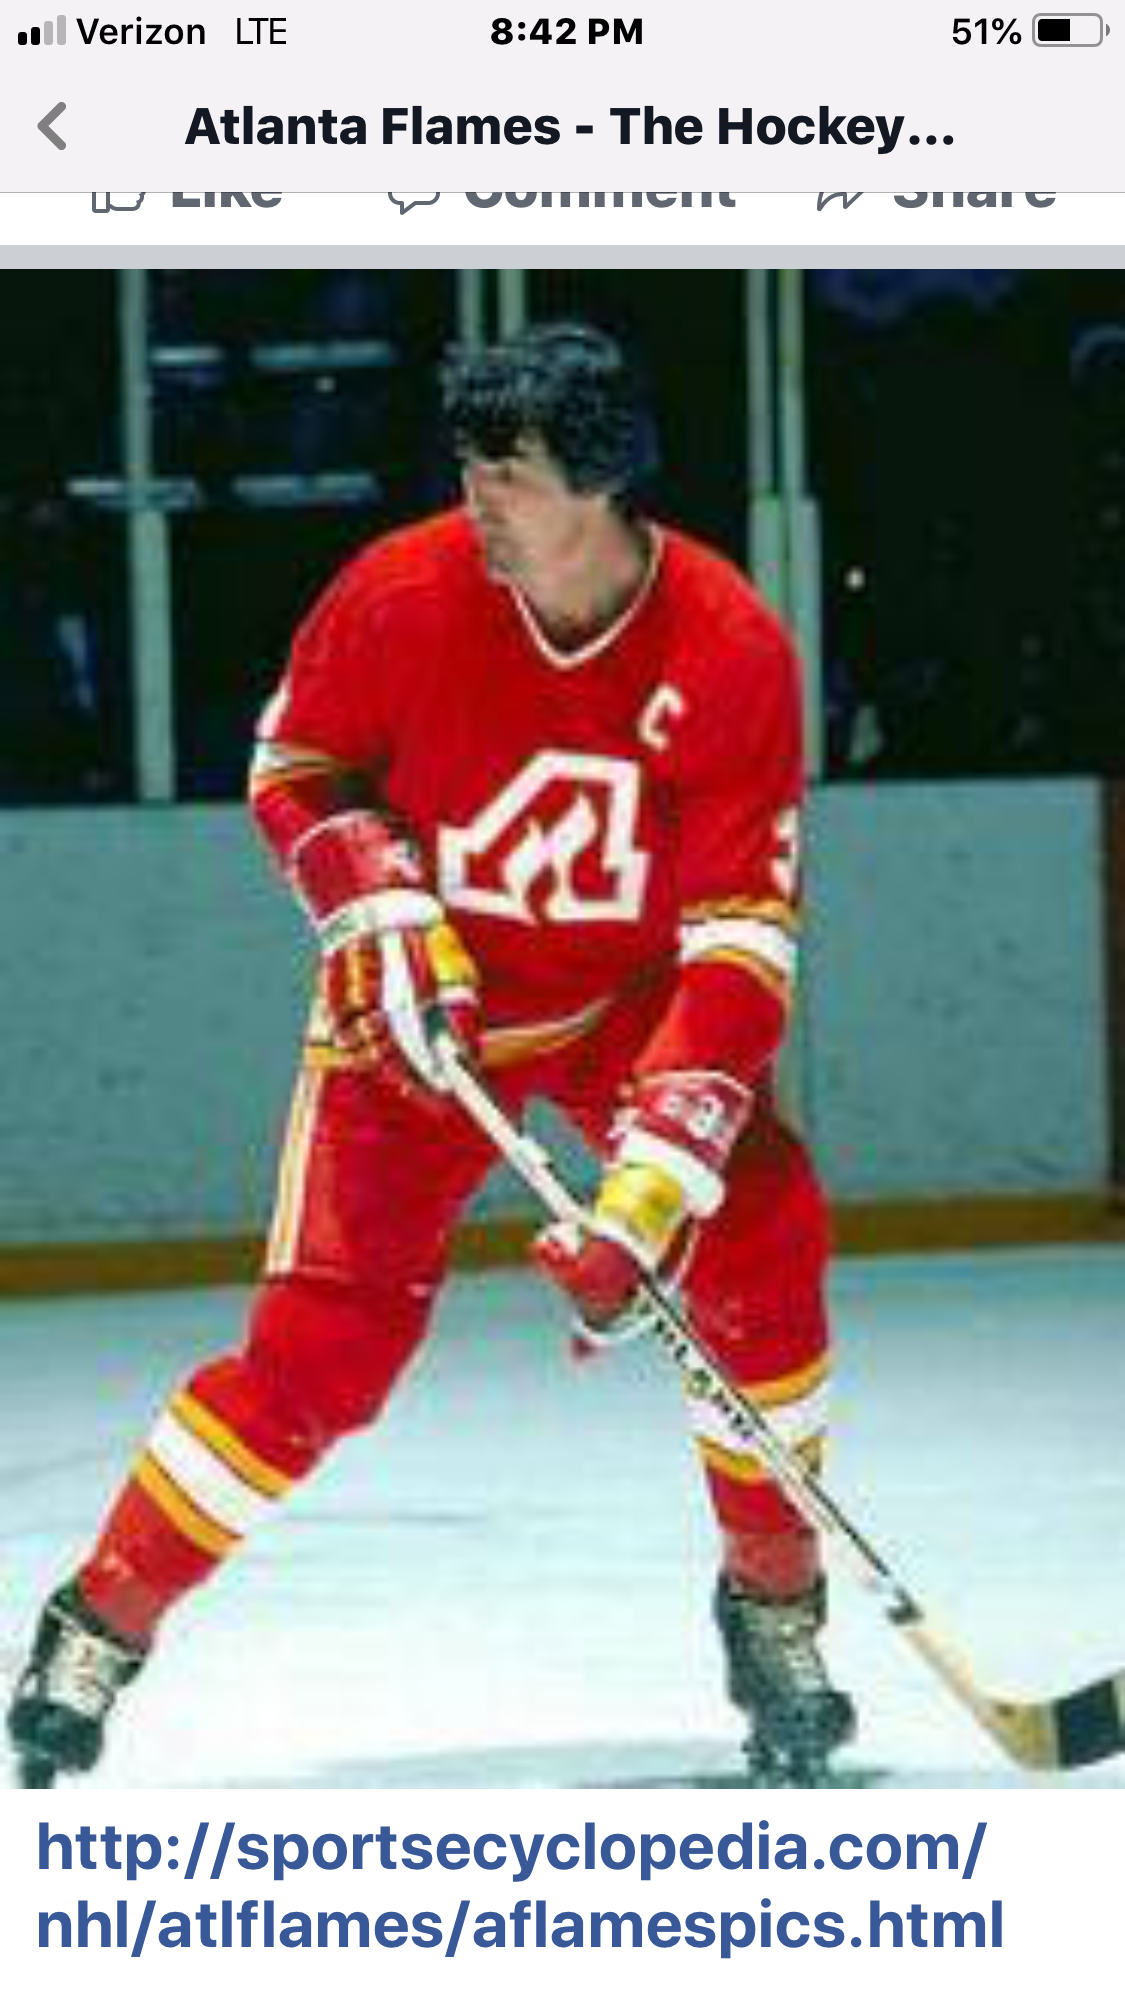 Pin By Geoffery Kehrig On Vintage N H L Hockey Teams Nhl Hockey